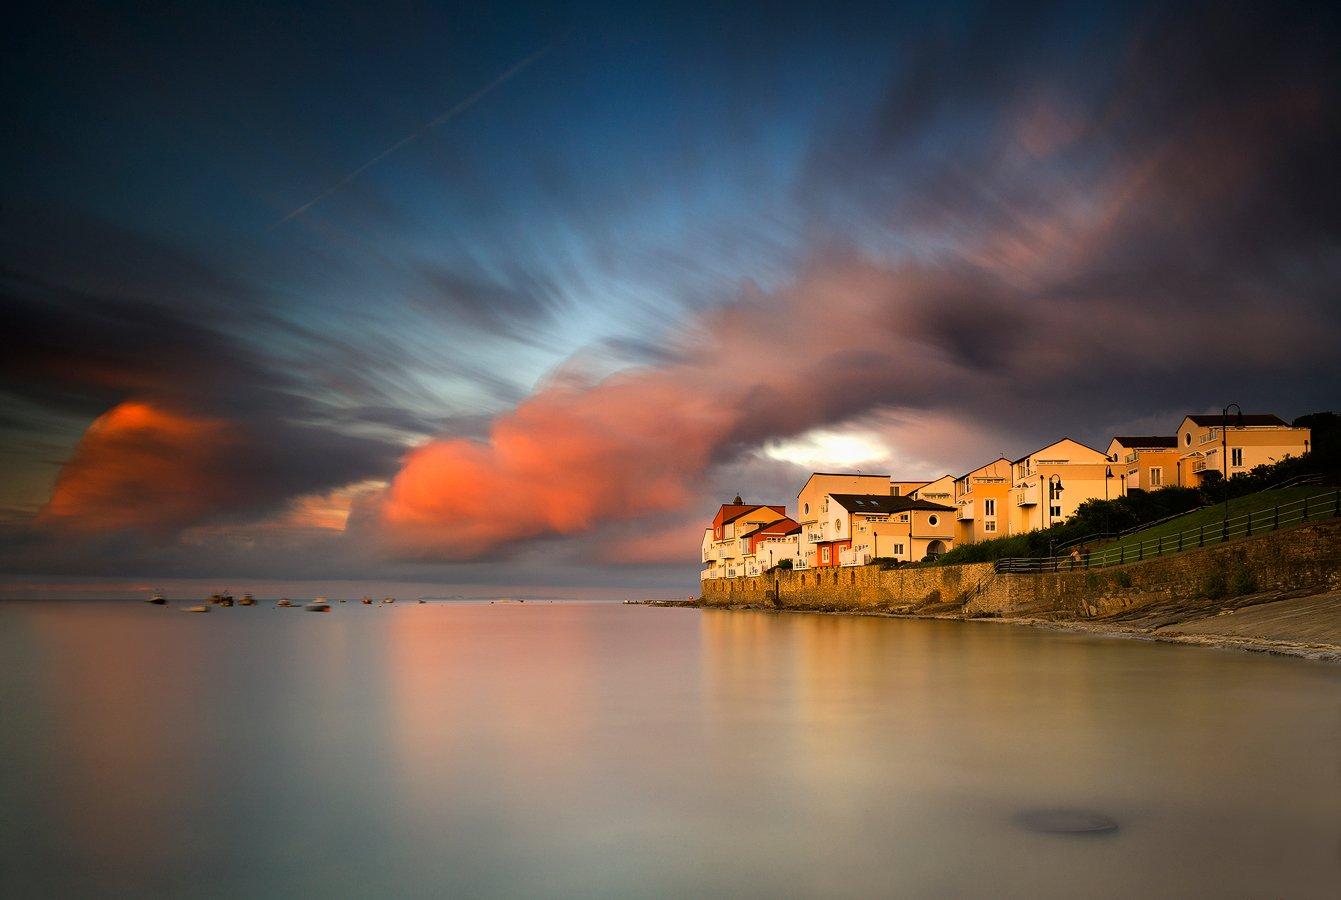 Clouds, Seascape, Sunrise, Sunset, Swanage, Rafal